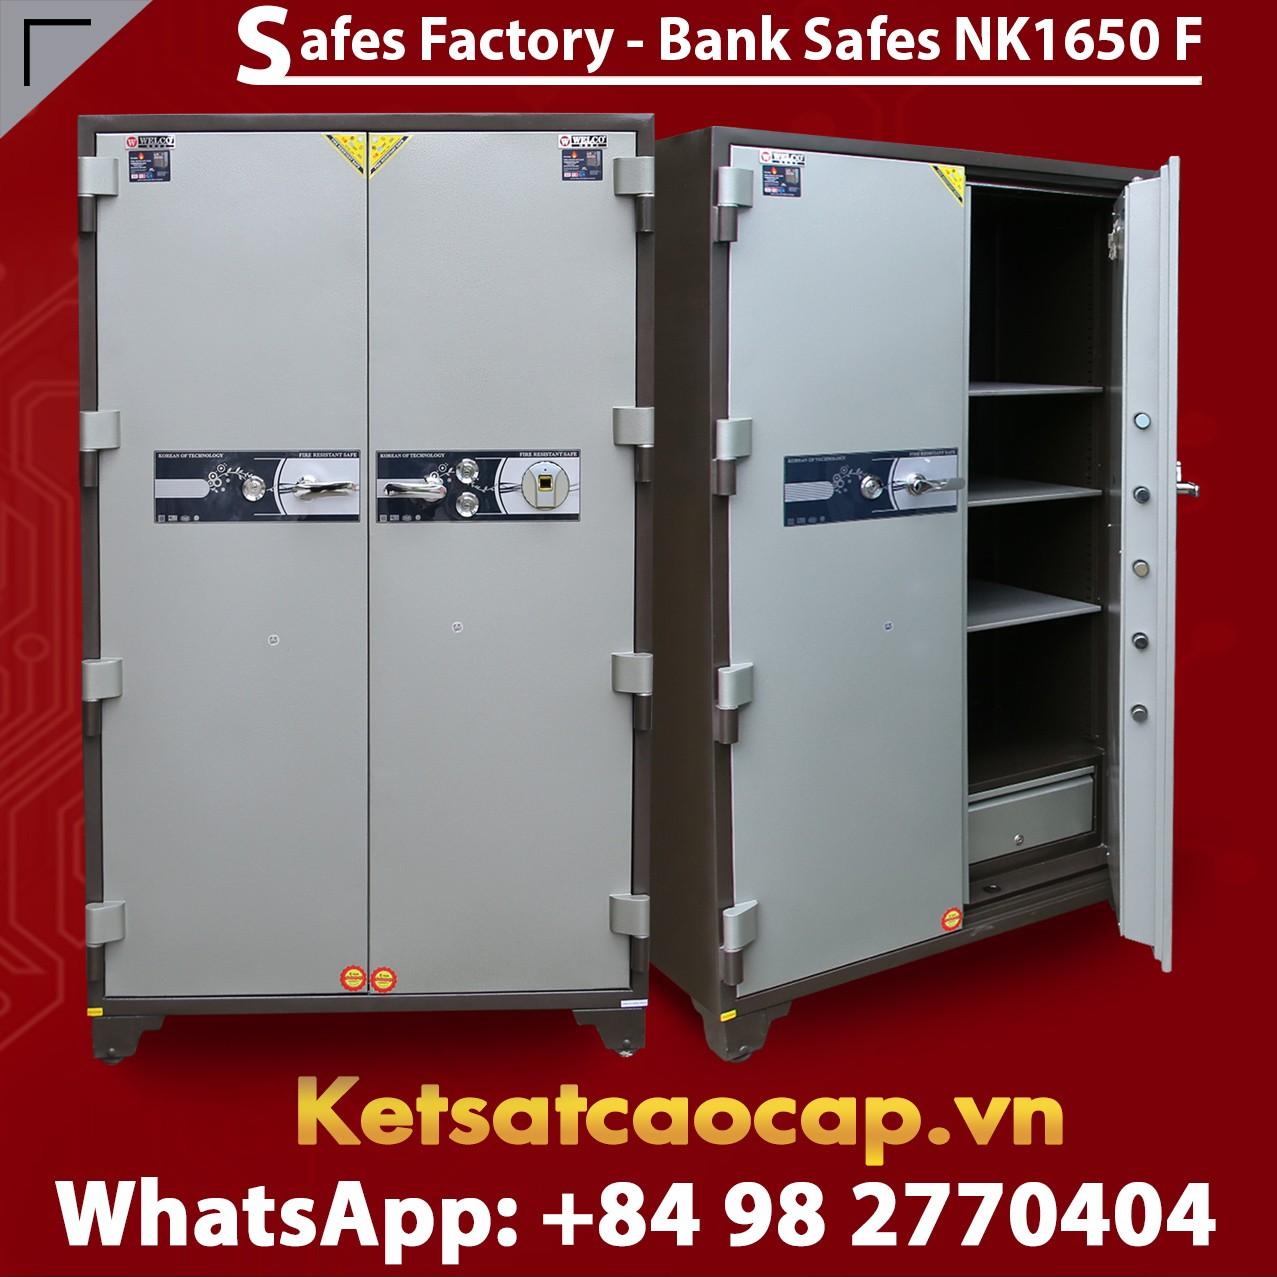 Bank Safes Deposit Box Manufacturing Facility